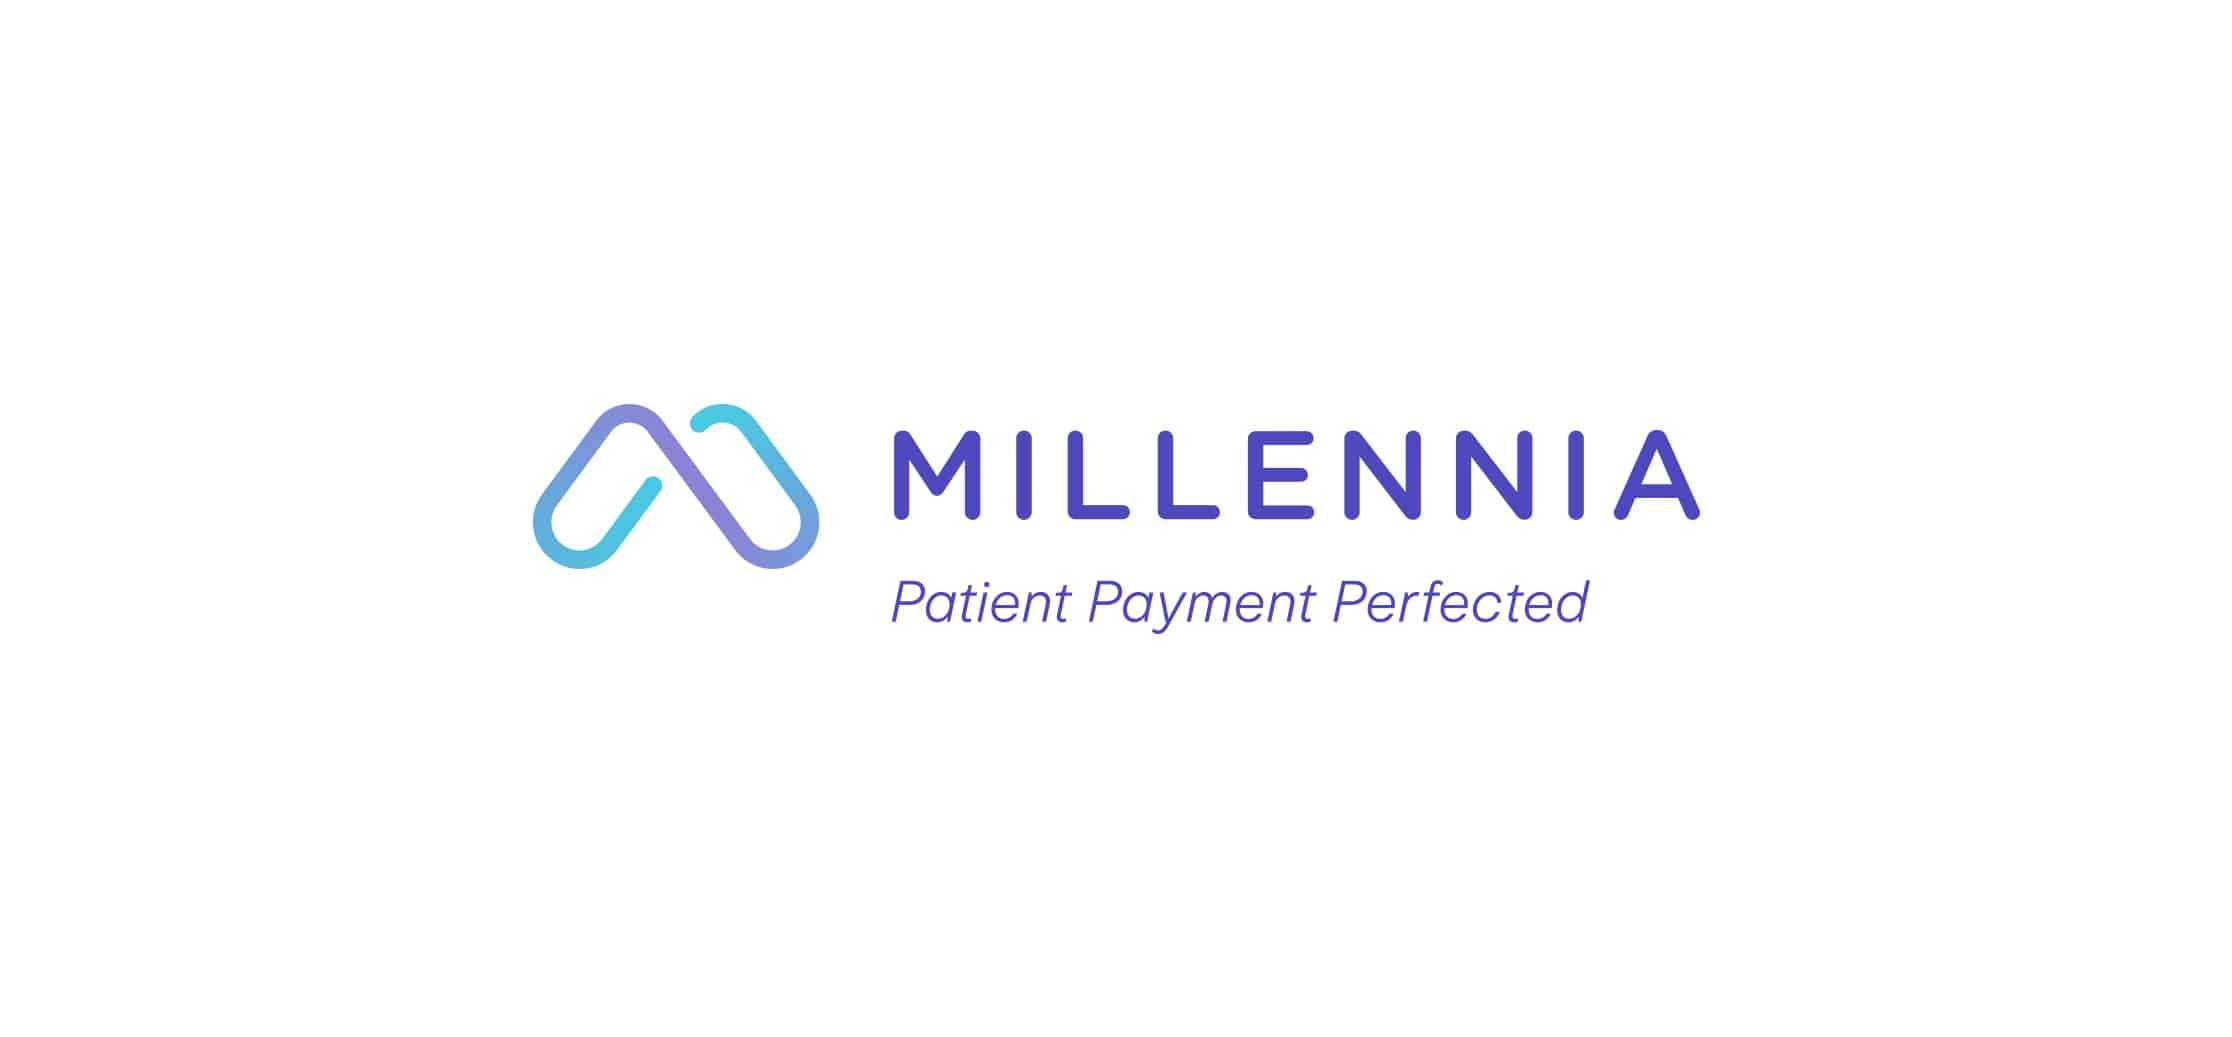 Millennia | Mekanic